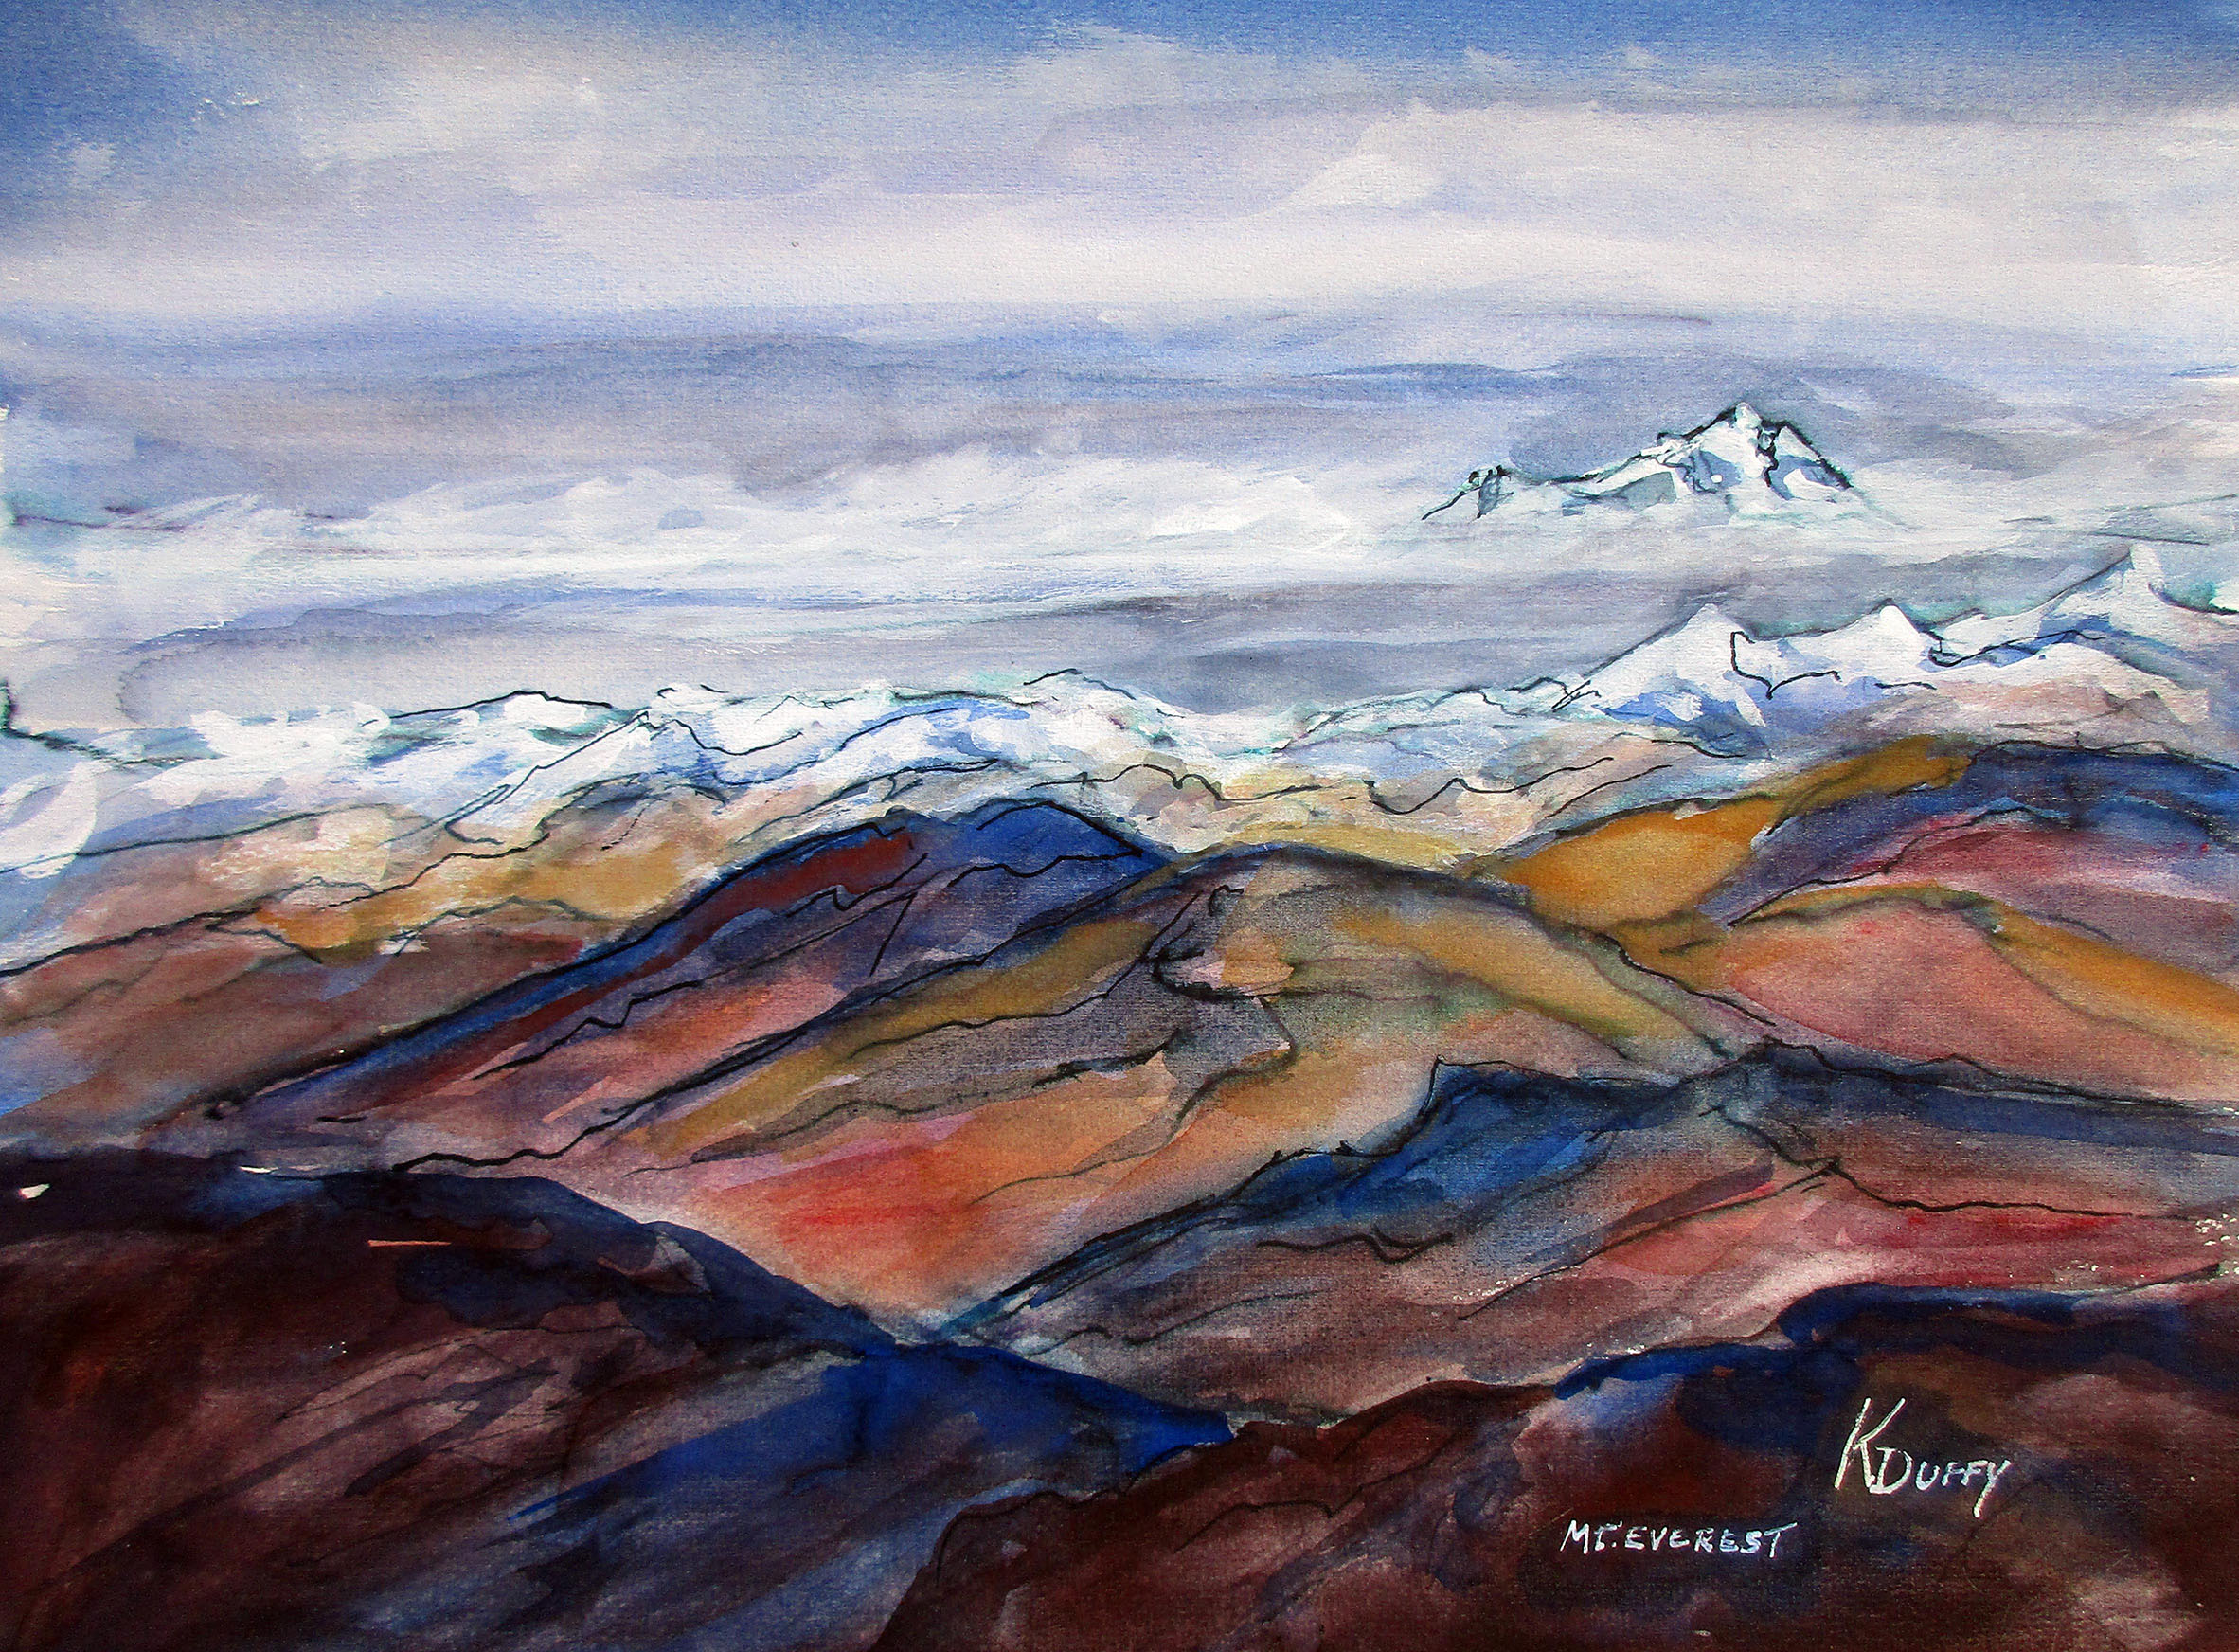 Mt. Everest Peeks Out